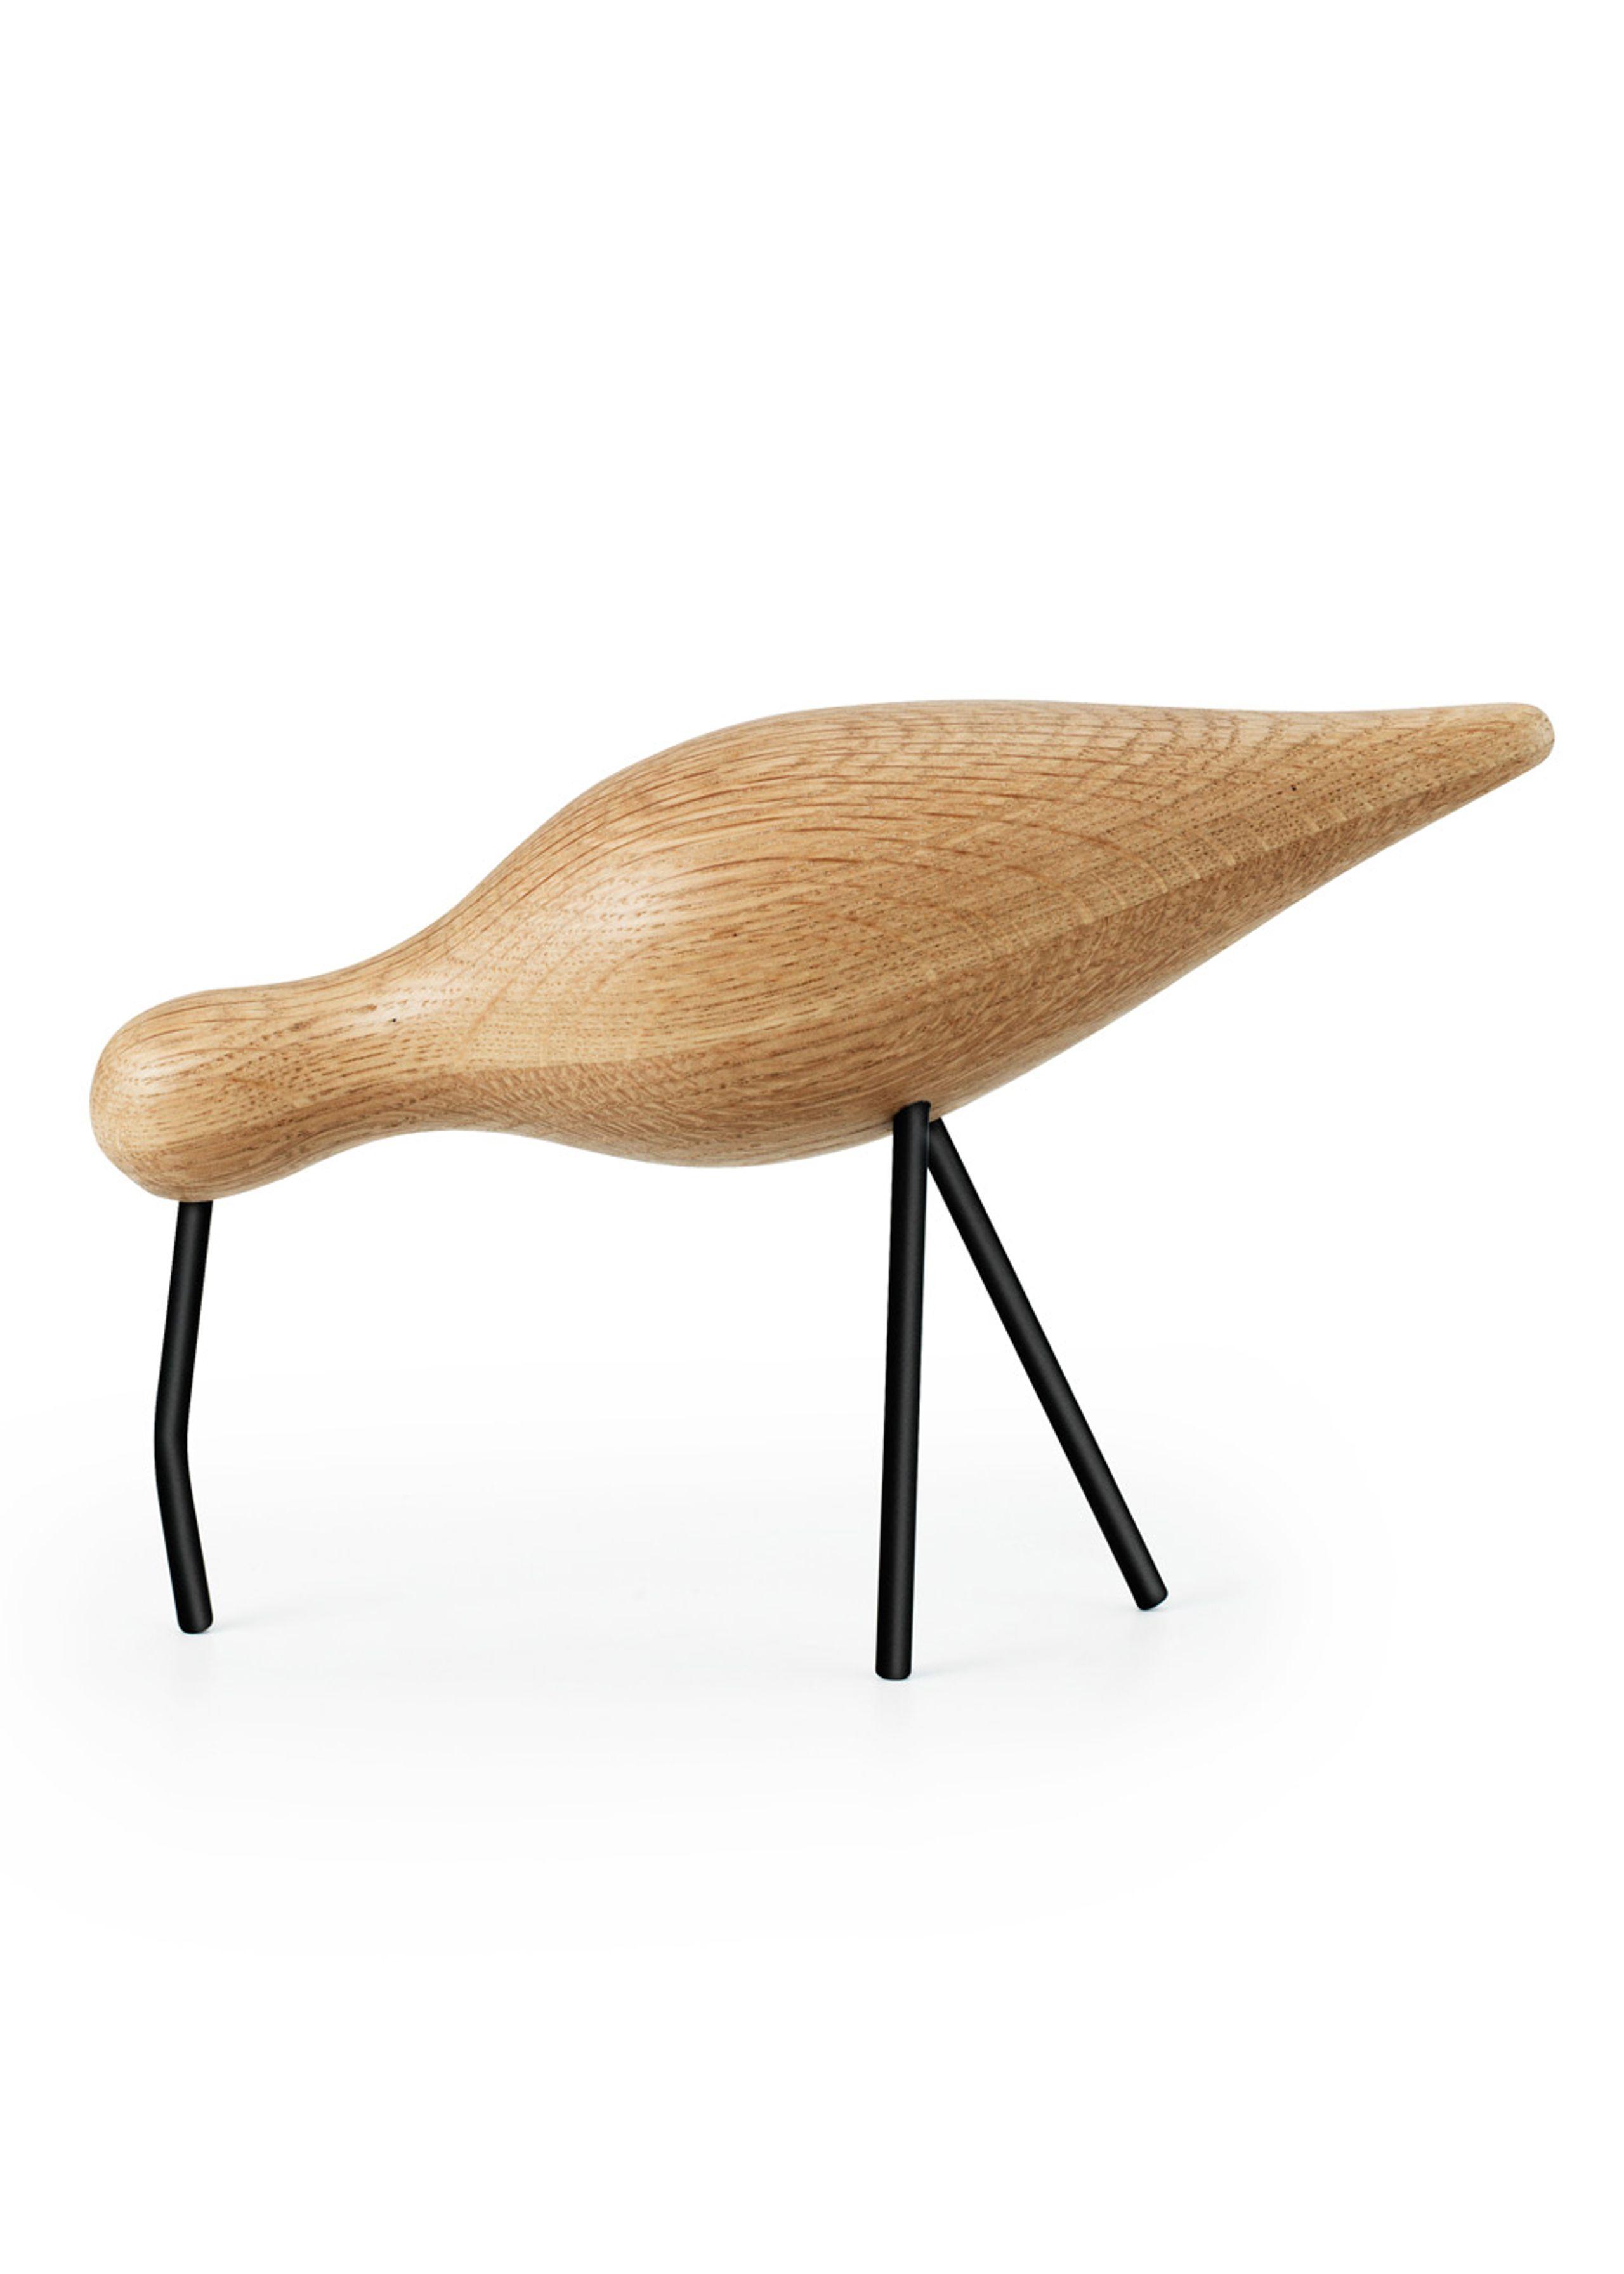 Image of   Shorebird